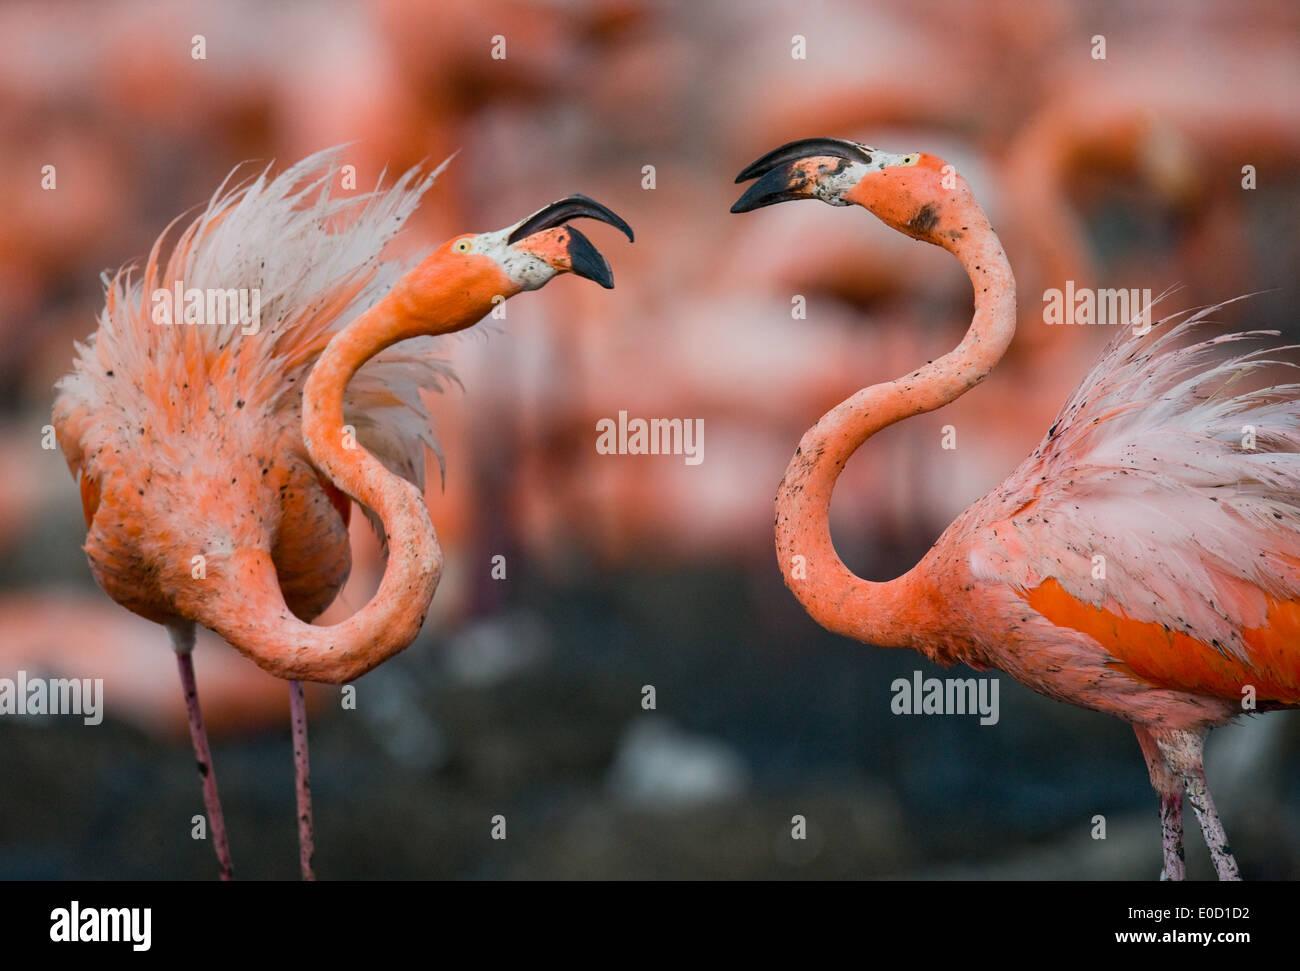 Carribean flamingos at nesting site, Rio Maximo Reserve, Cuba (Phoenicopterus ruber) - Stock Image